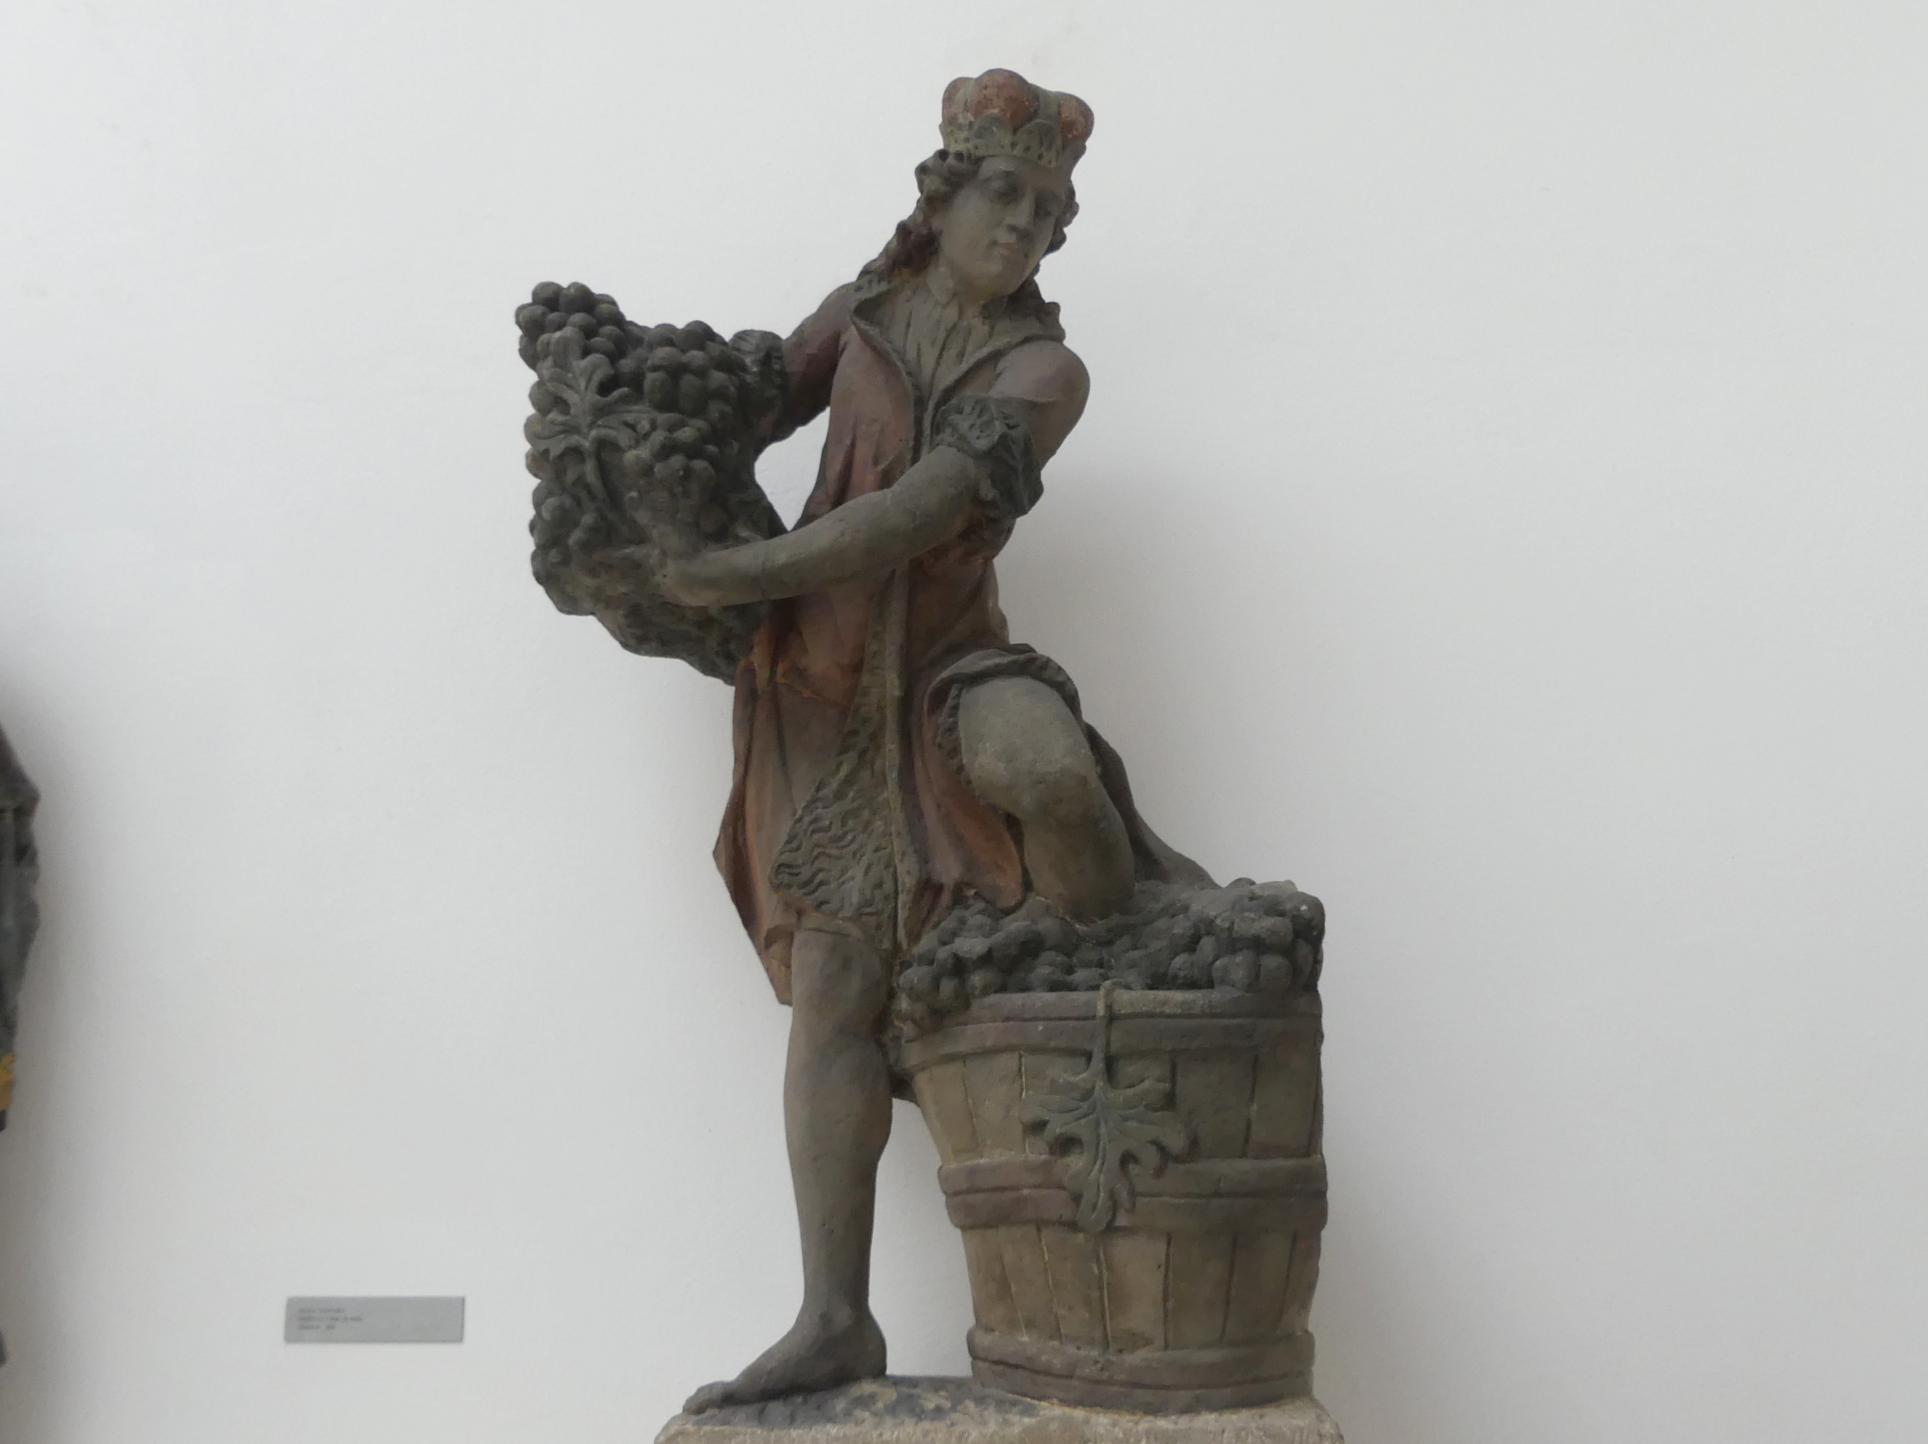 Johann Brokoff: Hl. Wenzel als Winzer, Beginn 18. Jhd.